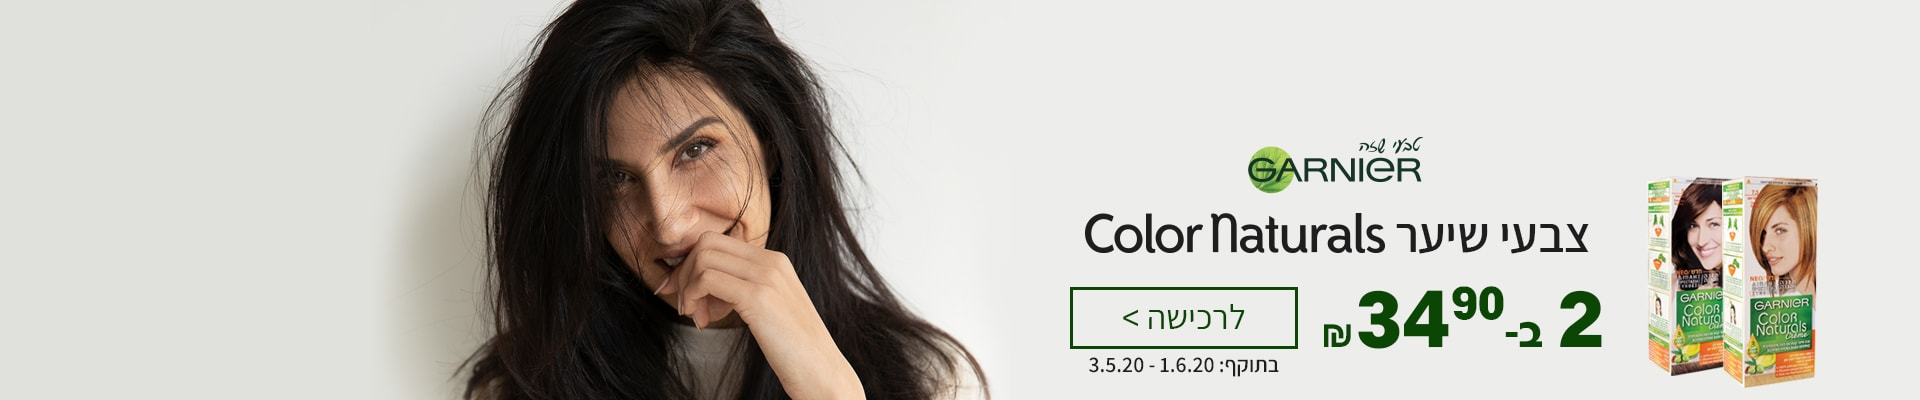 צבעי שיער COLOR NATURALS 2 ב- 34.90 ₪. בתוקף 3.5.20-1.6.20